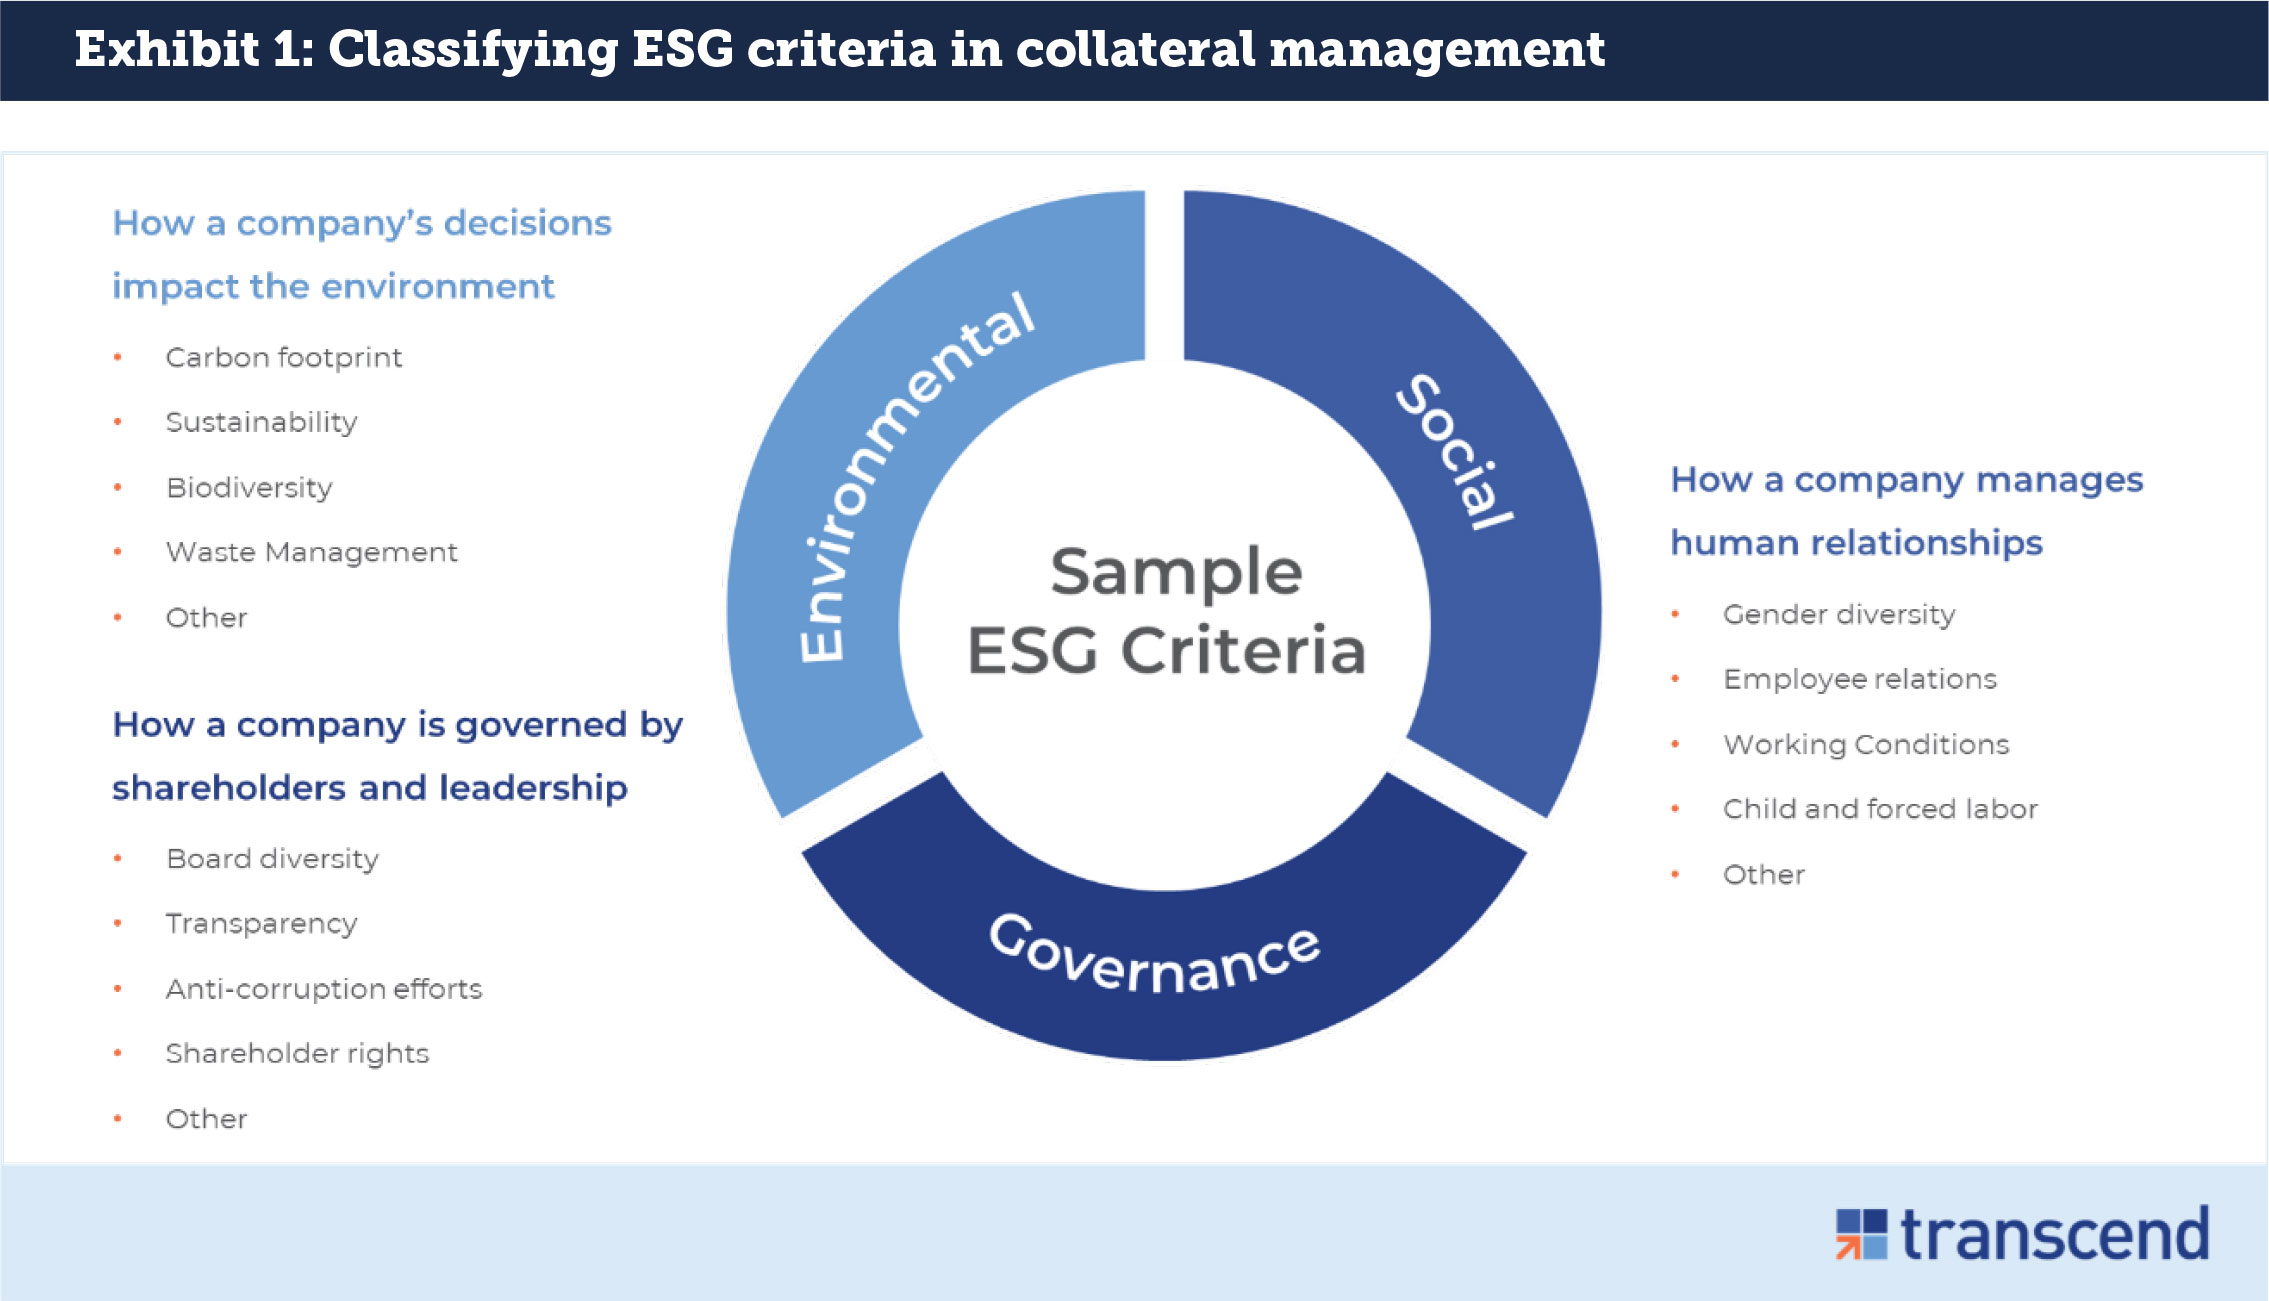 Sample ESG Collateral Criteria